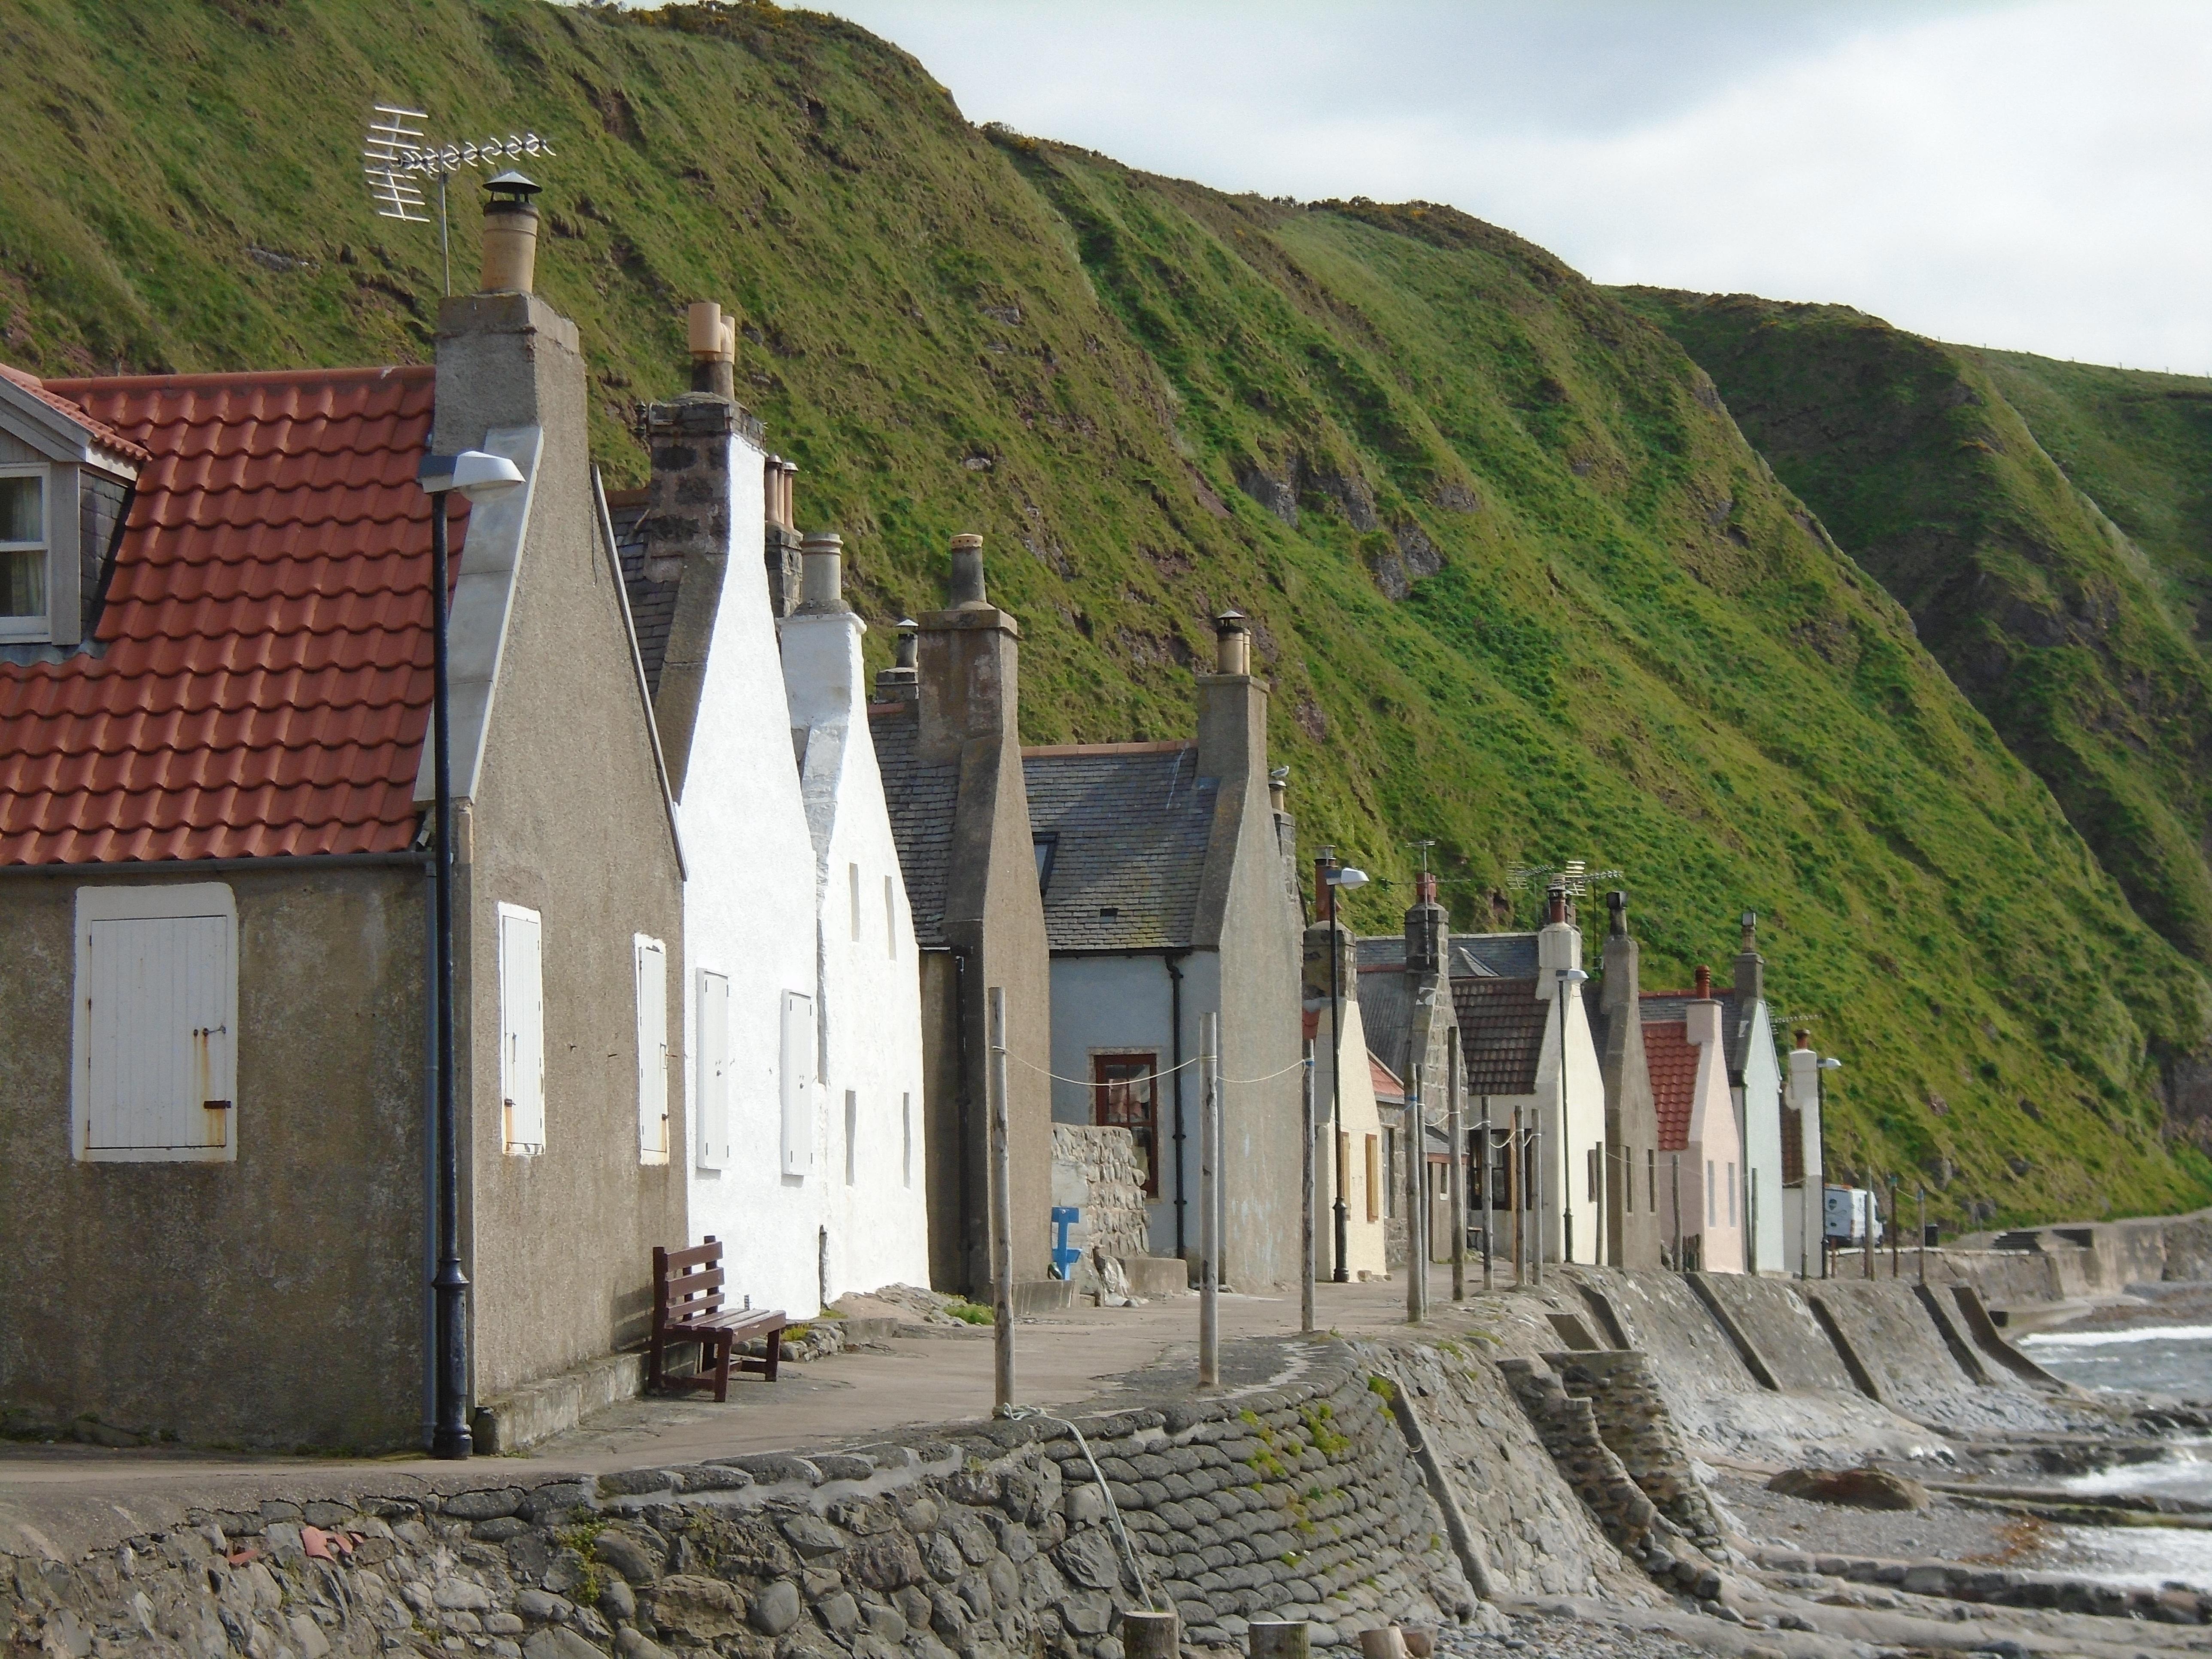 Free Images : landscape, coast, town, old, mountain range, village